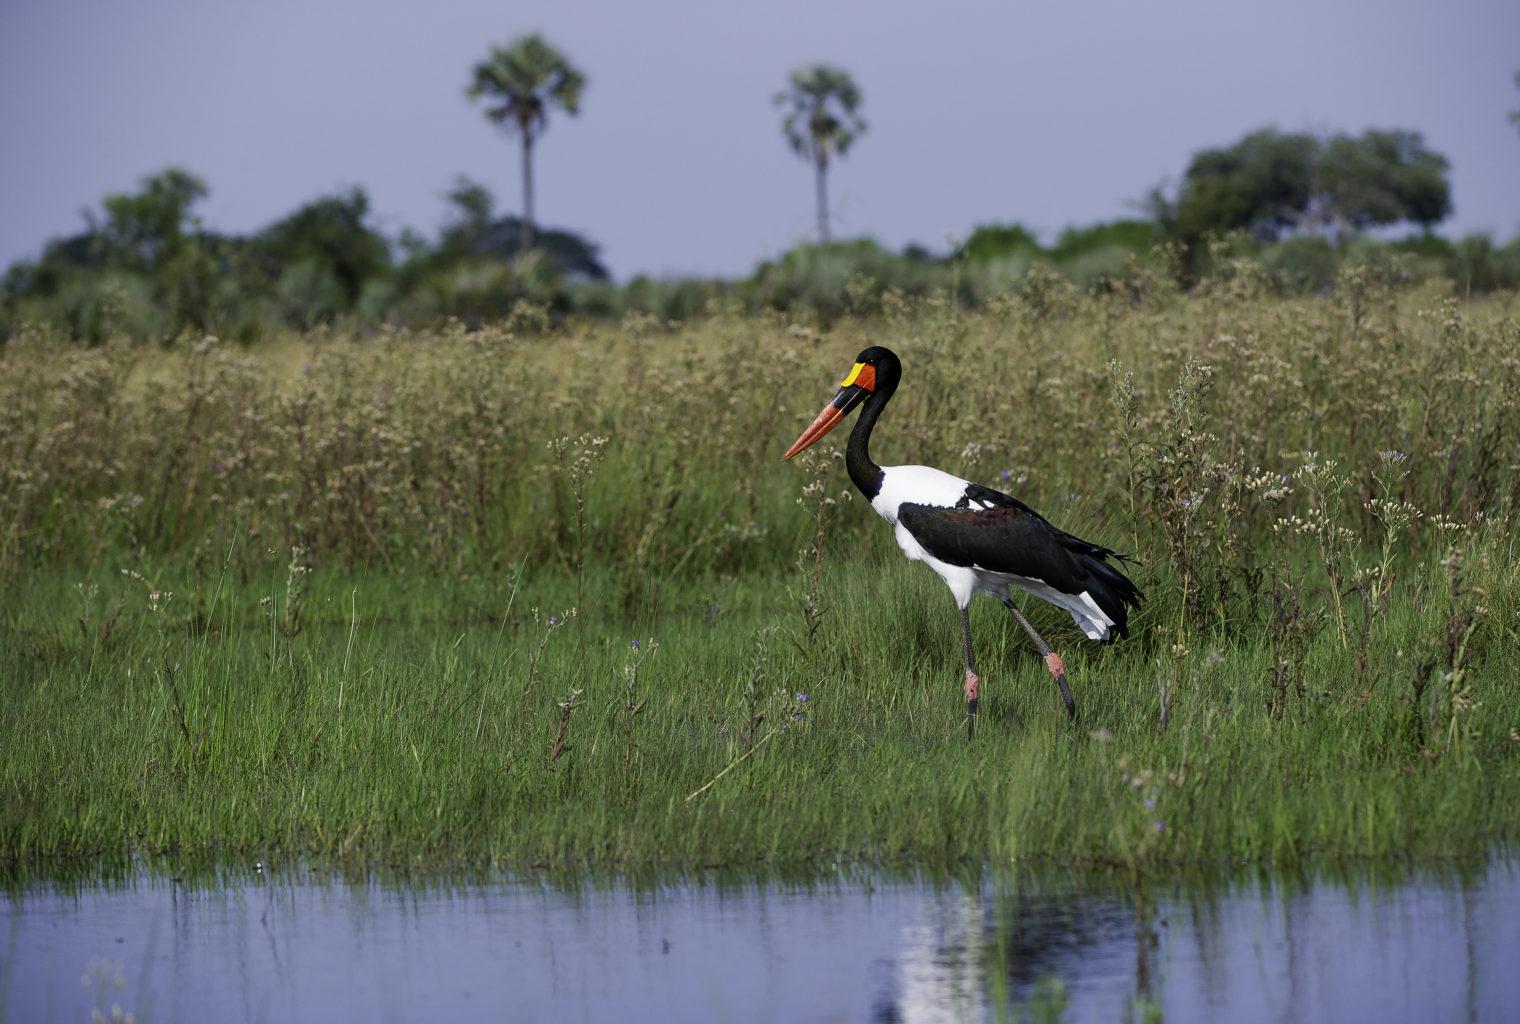 Botswana, Okavango Delta, Kwetsani Wildlife